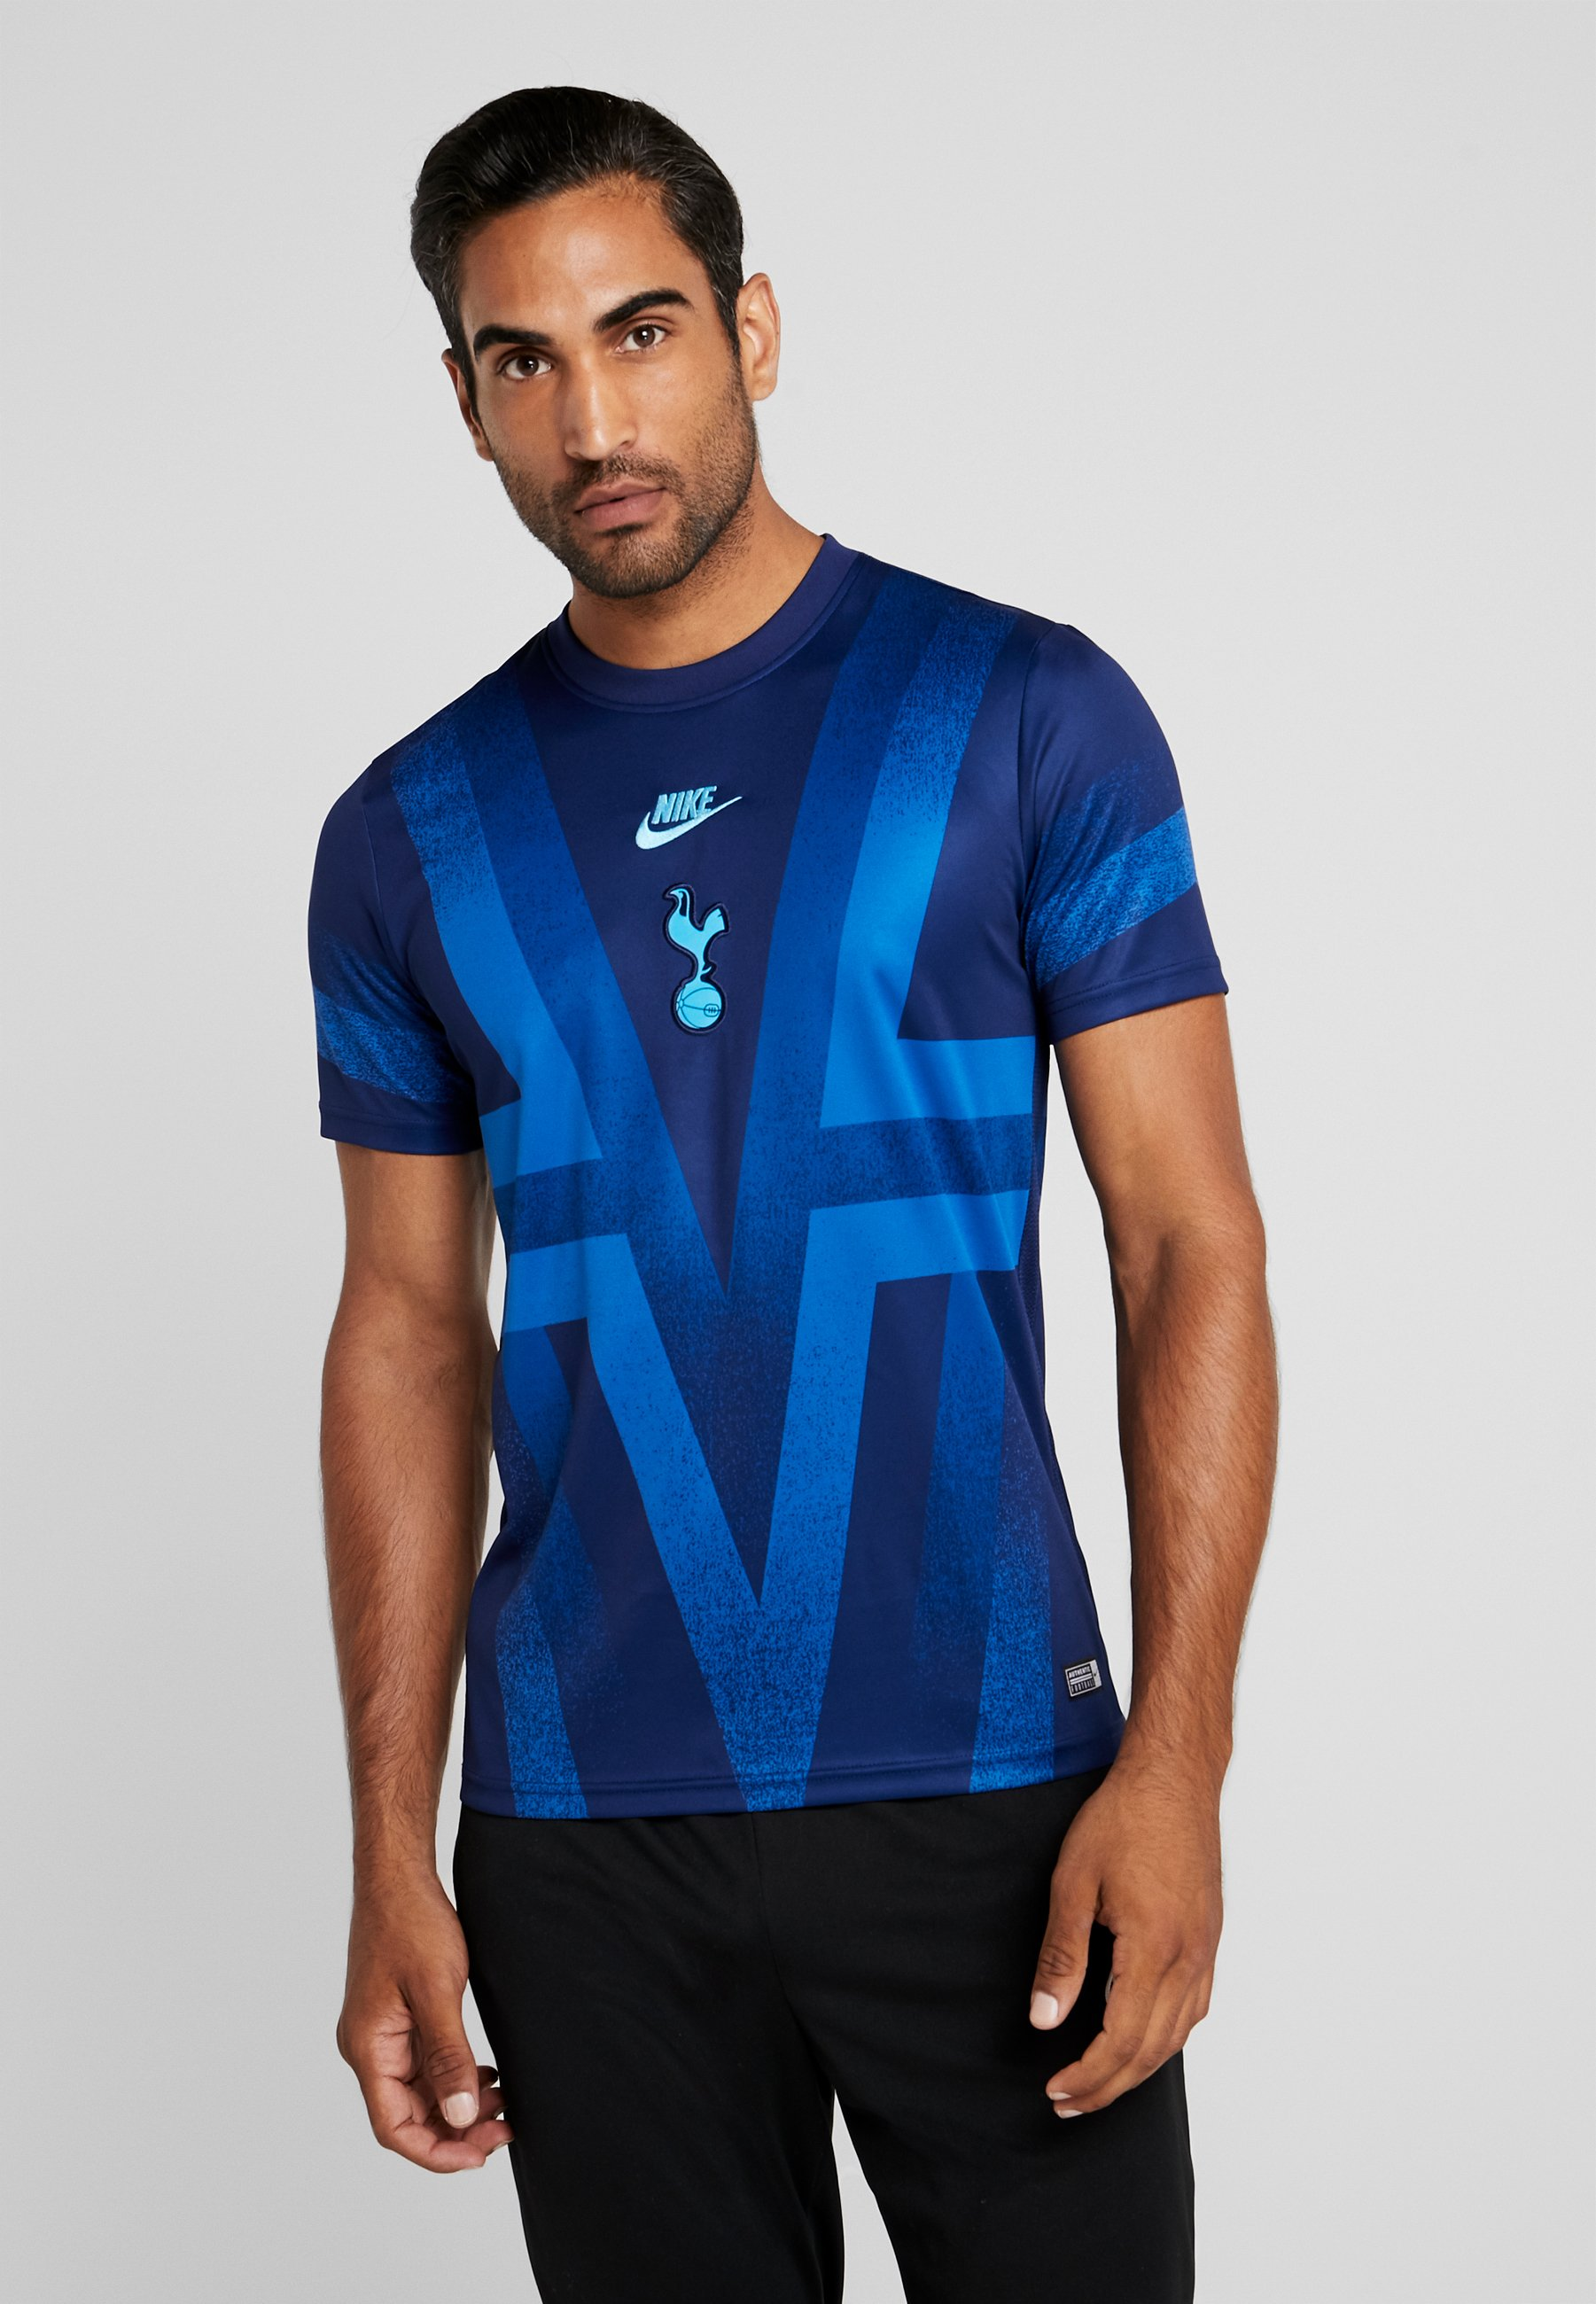 Hotspurs Tottenham Royal Nike Performance DrySquadra Binary Blue team 3j4A5LqR